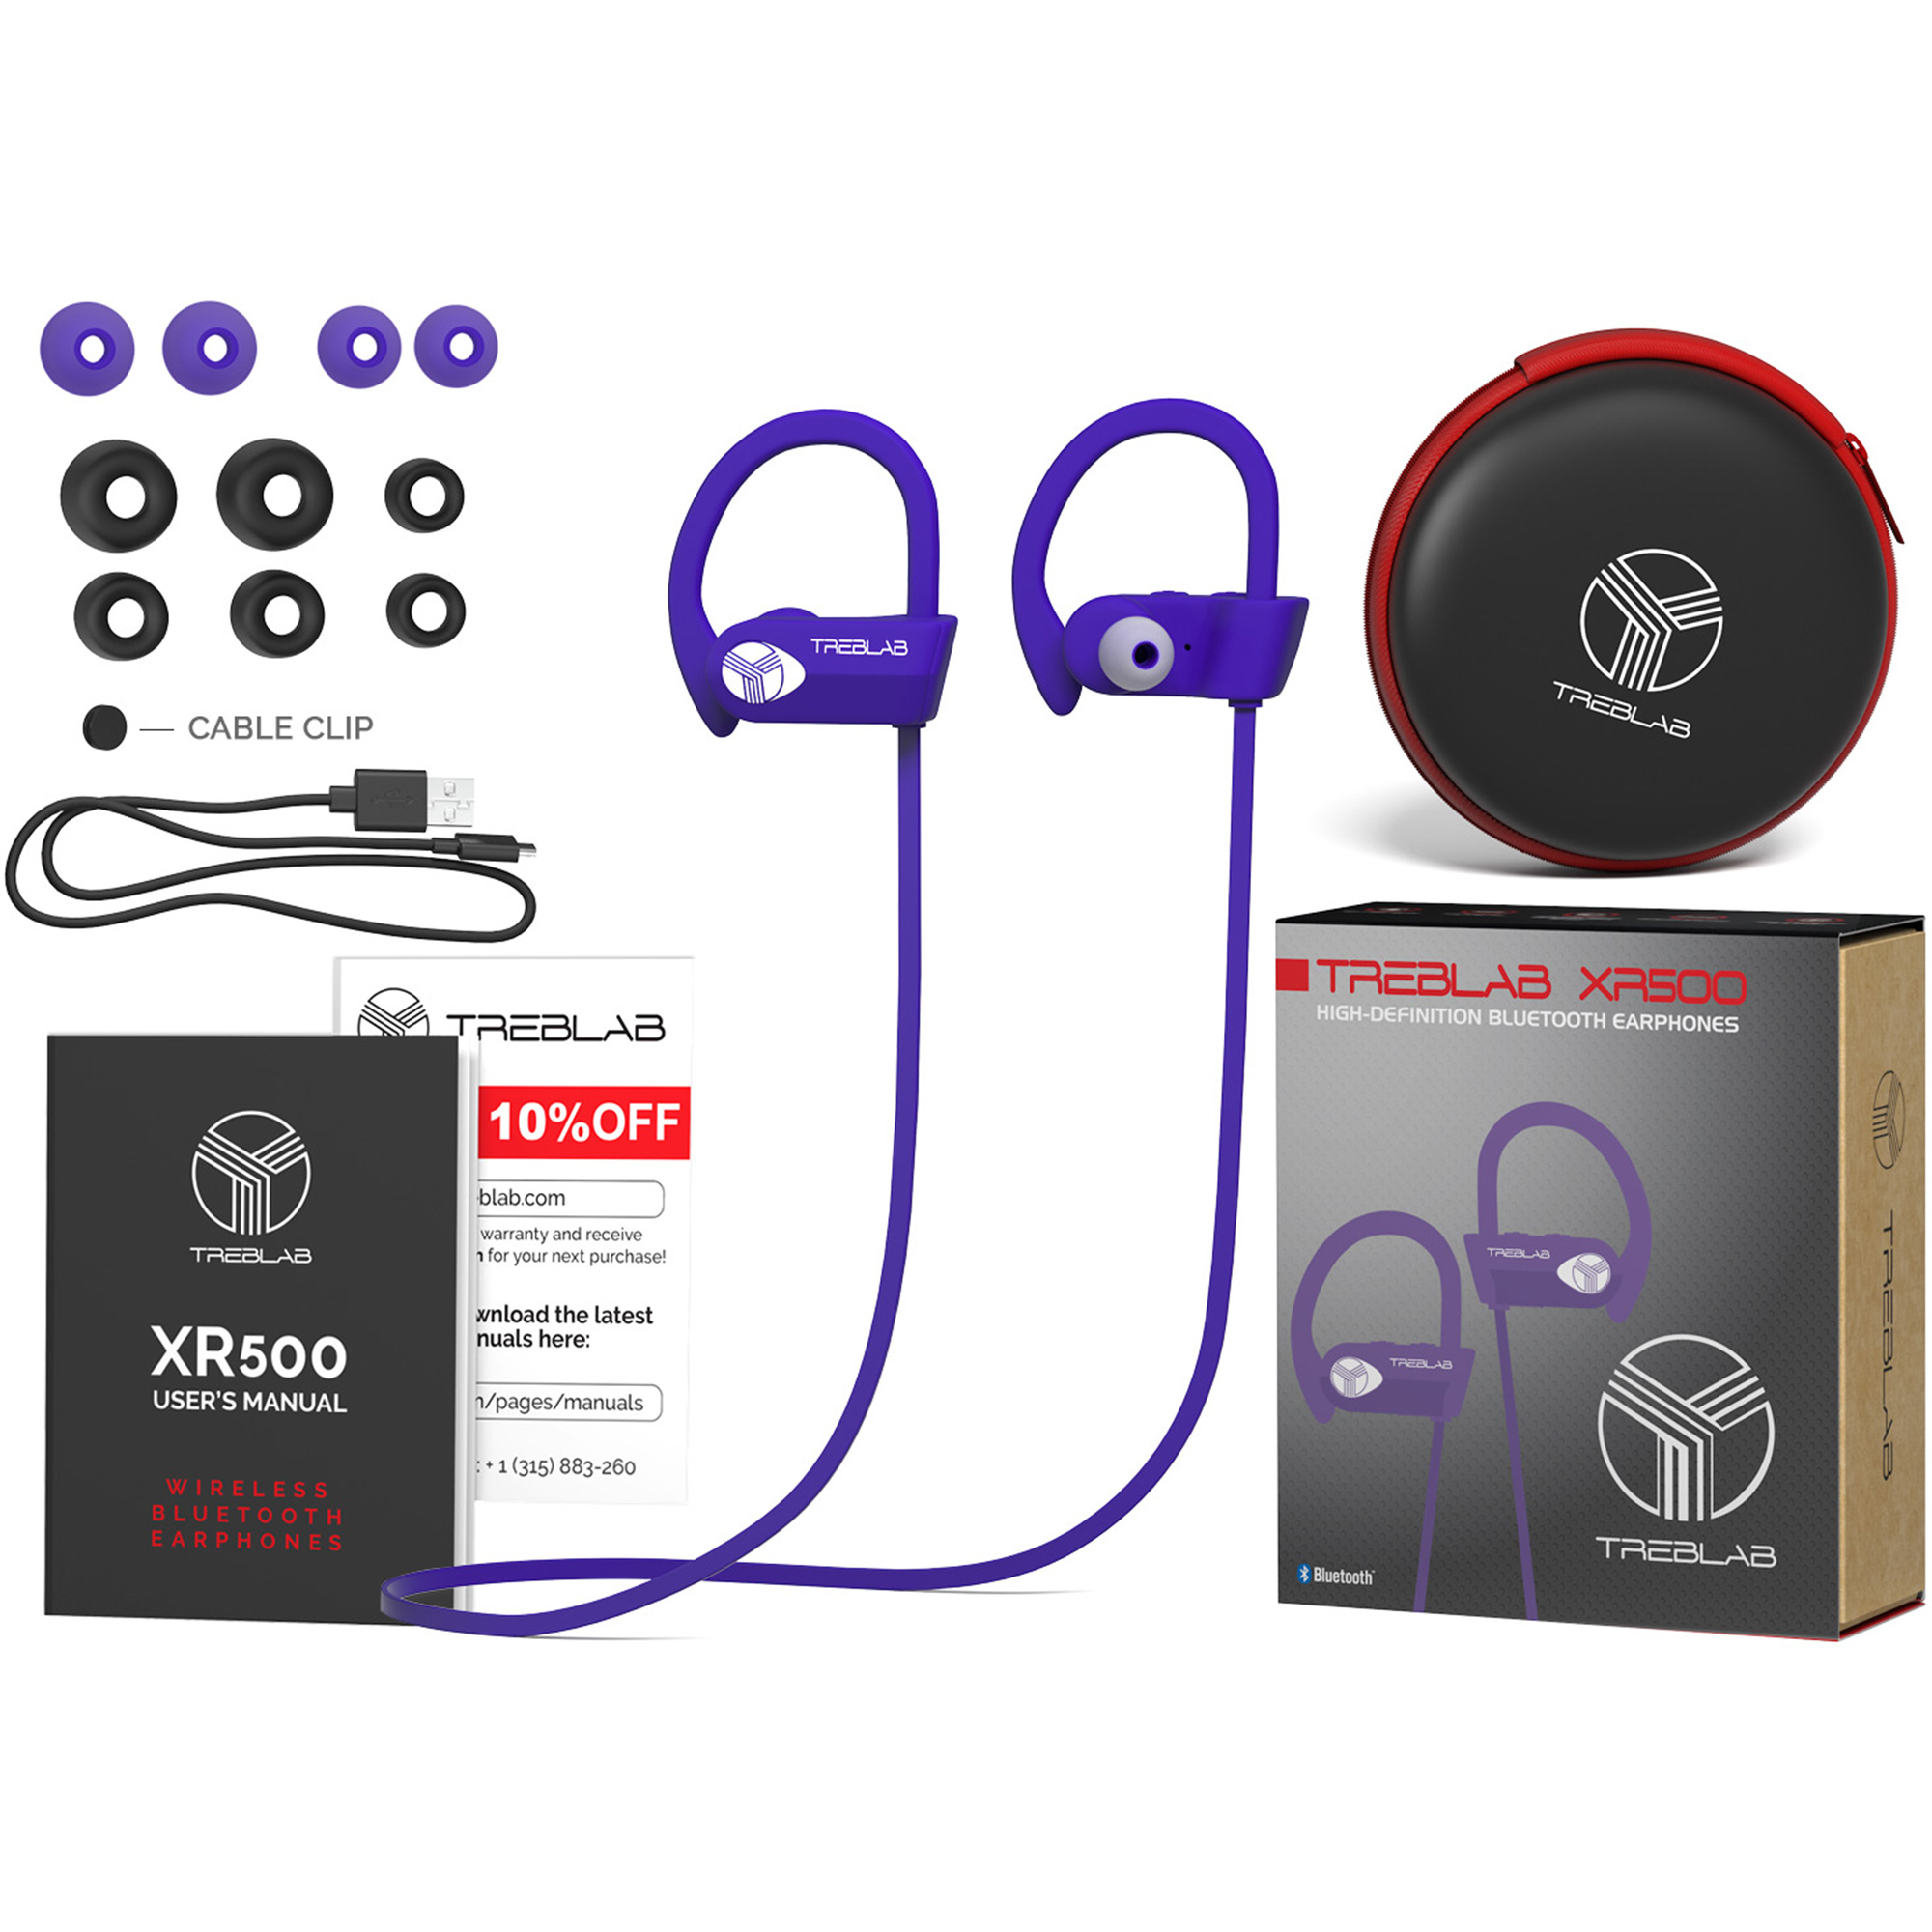 TREBLAB XR500 Bluetooth Headphones, Wireless Earbuds for Sports, Running or Gym Workout. IPX7 Waterproof, Sweatproof, Secure-Fit Headset.